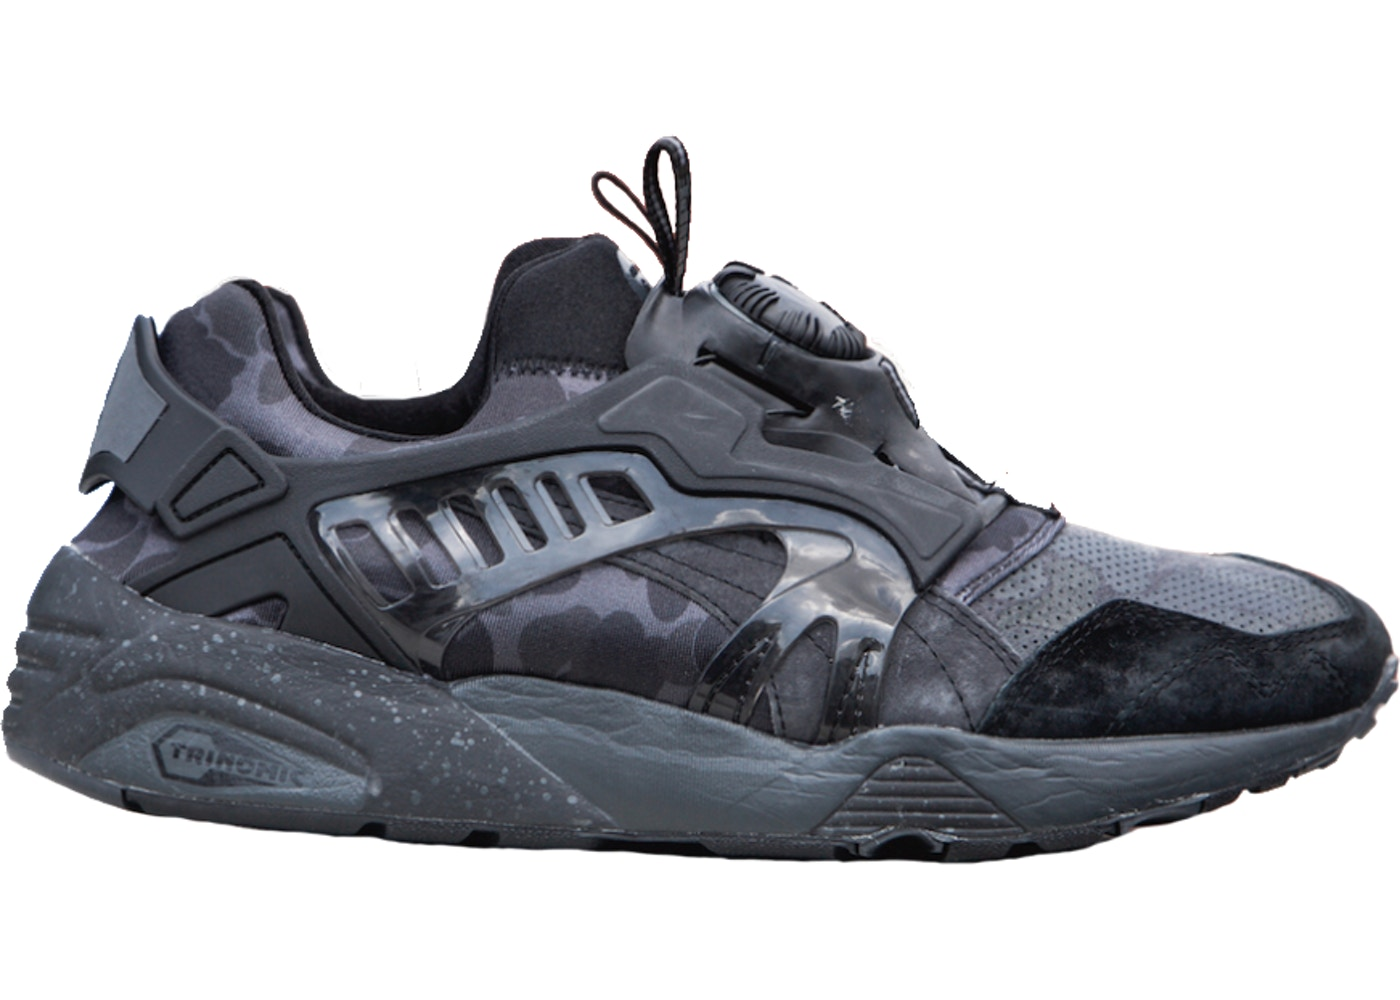 2fb6542b86ad38 Puma Size 6 Shoes - Total Sold